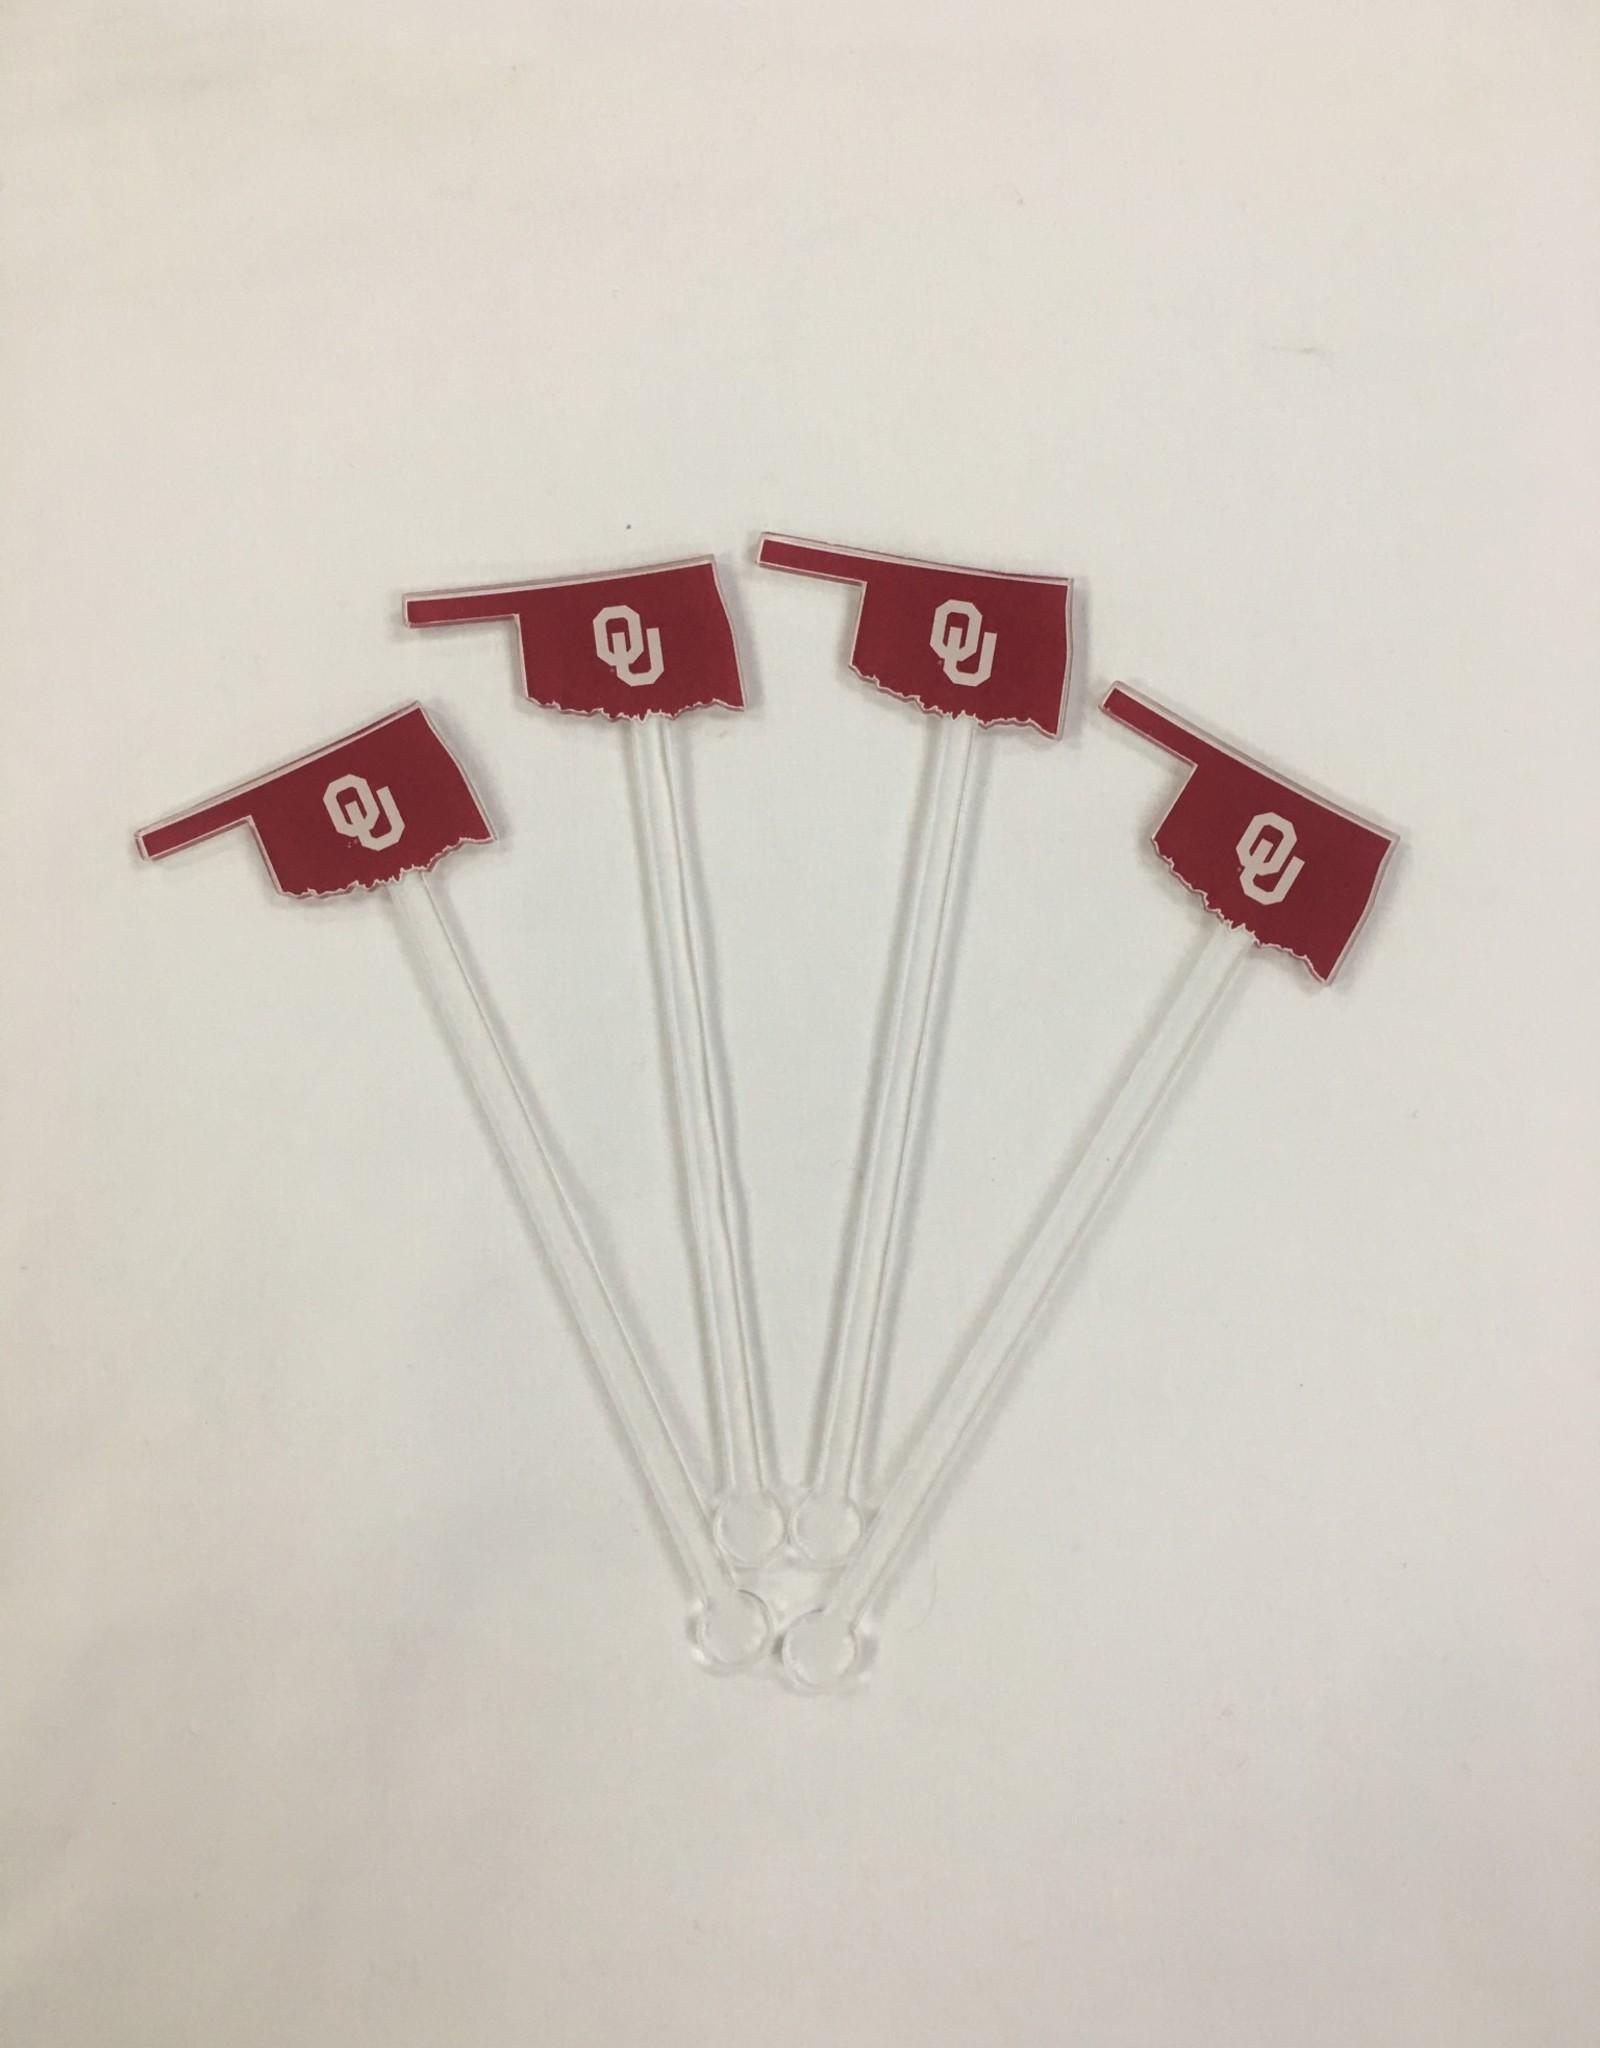 Acrylic Sticks Co. Acrylic Stir Sticks-STATE SHAPE/OU (pkg. or 4)